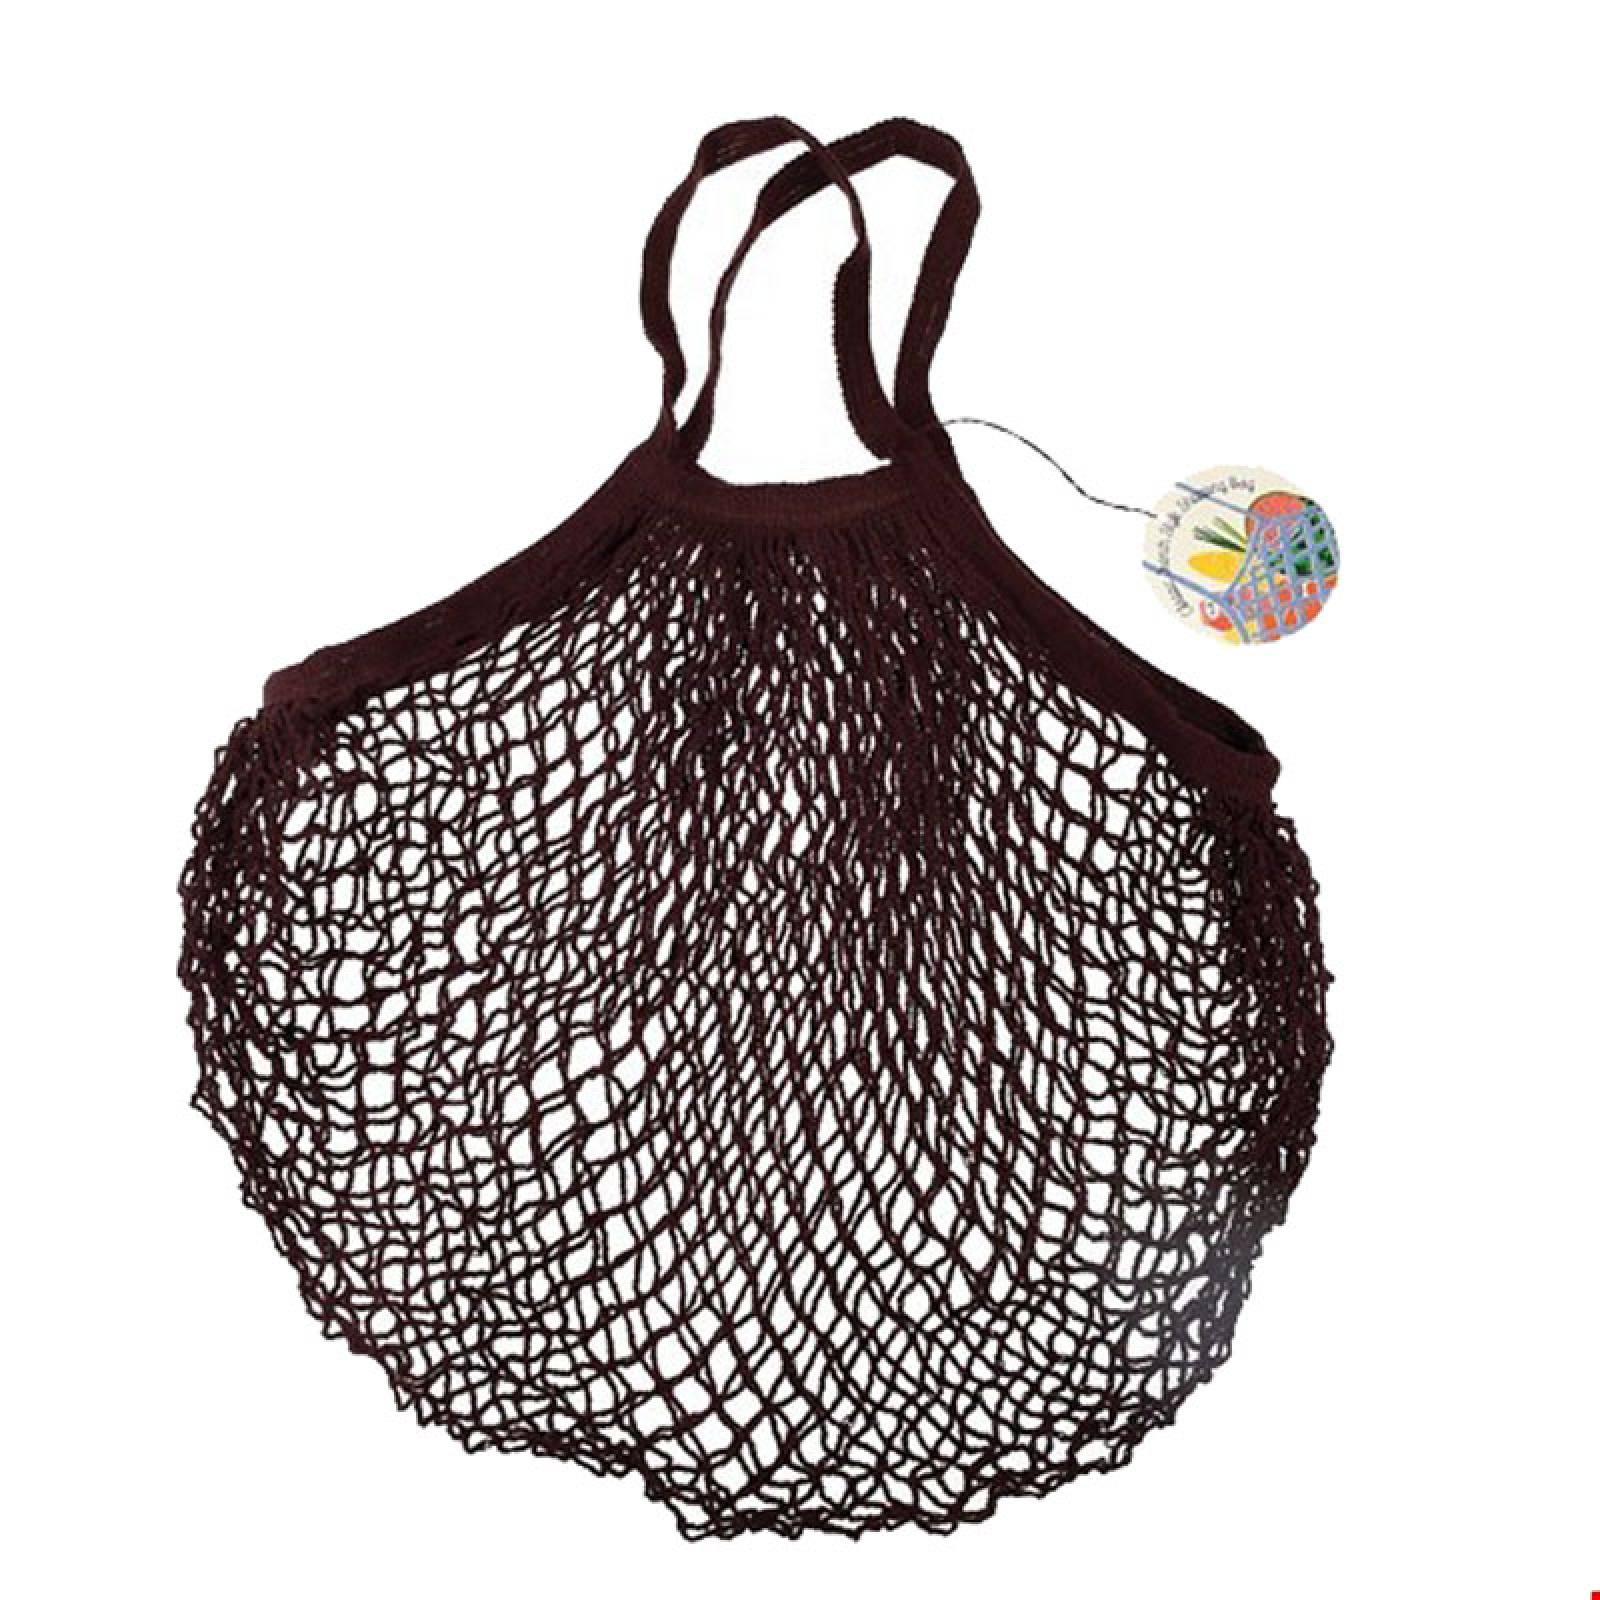 Chocolate Brown String Shopping Bag